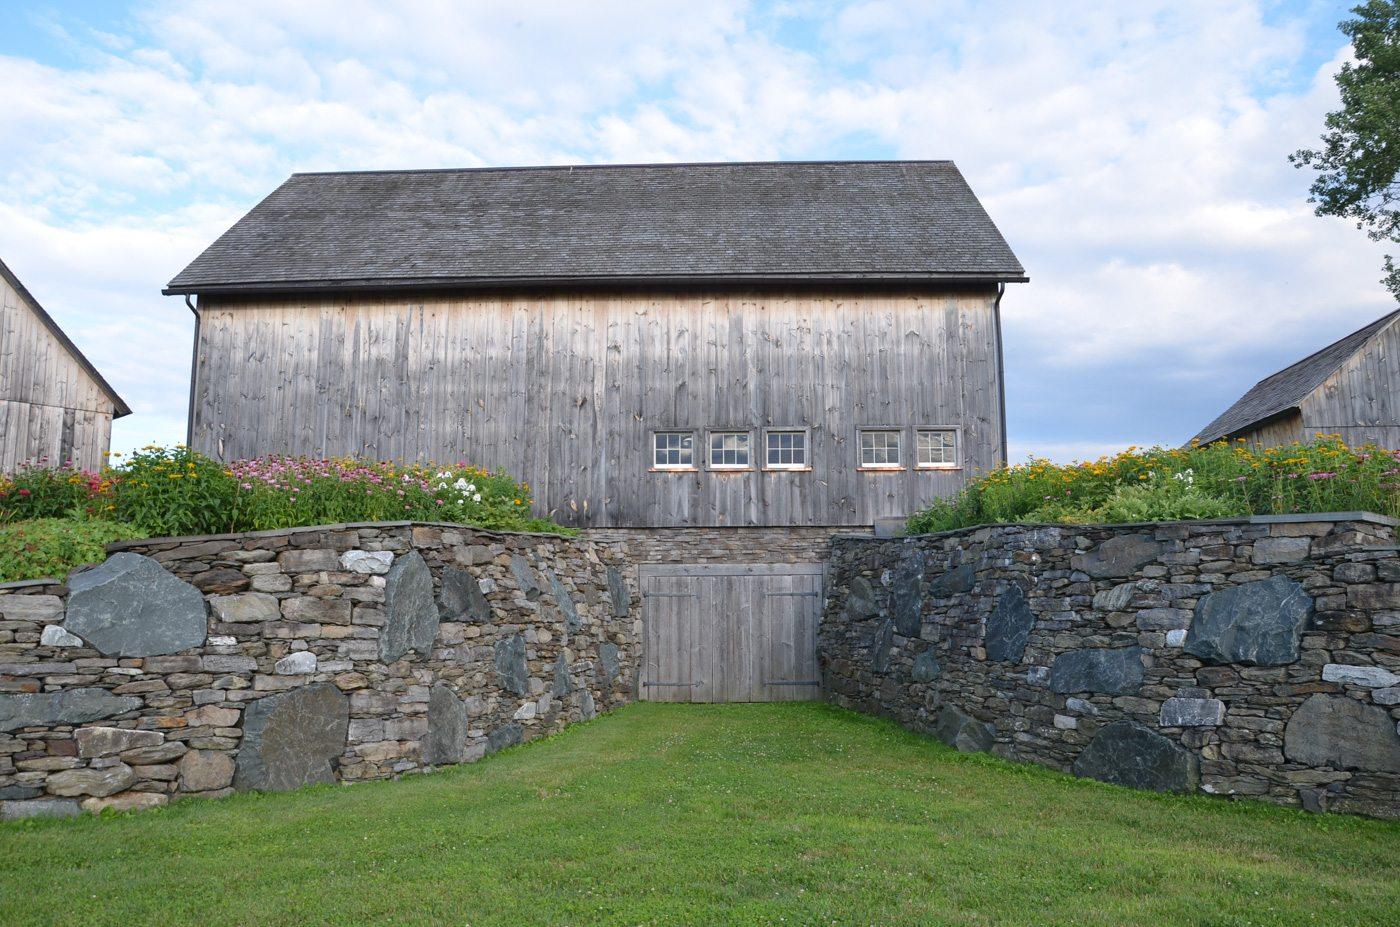 German Barn stone wall, 2014, Photograph by Constance Kheel